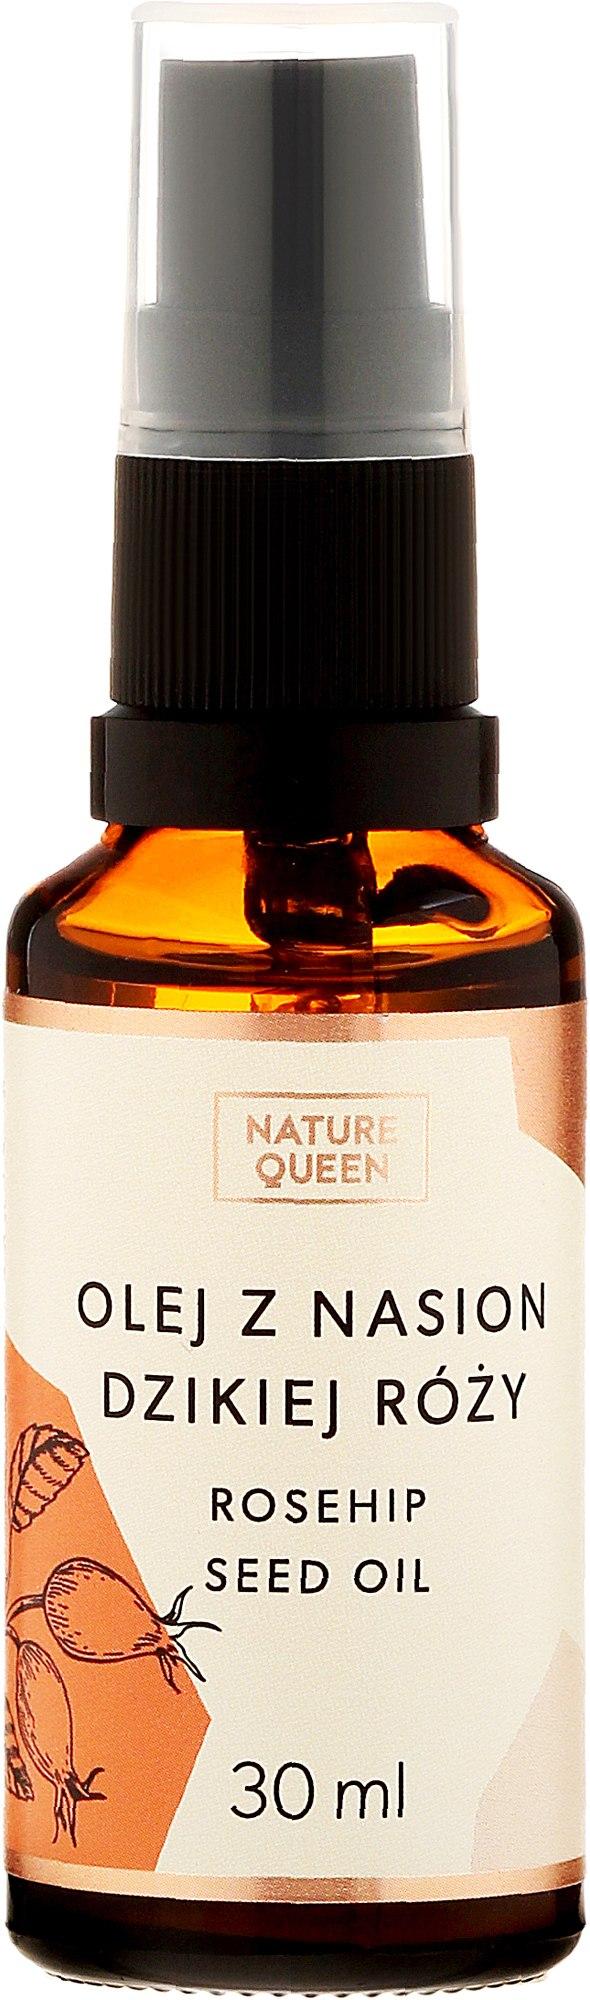 Kosmetisches Hagebuttenöl - Nature Queen Rosehip Seed Oil — Bild 30 ml